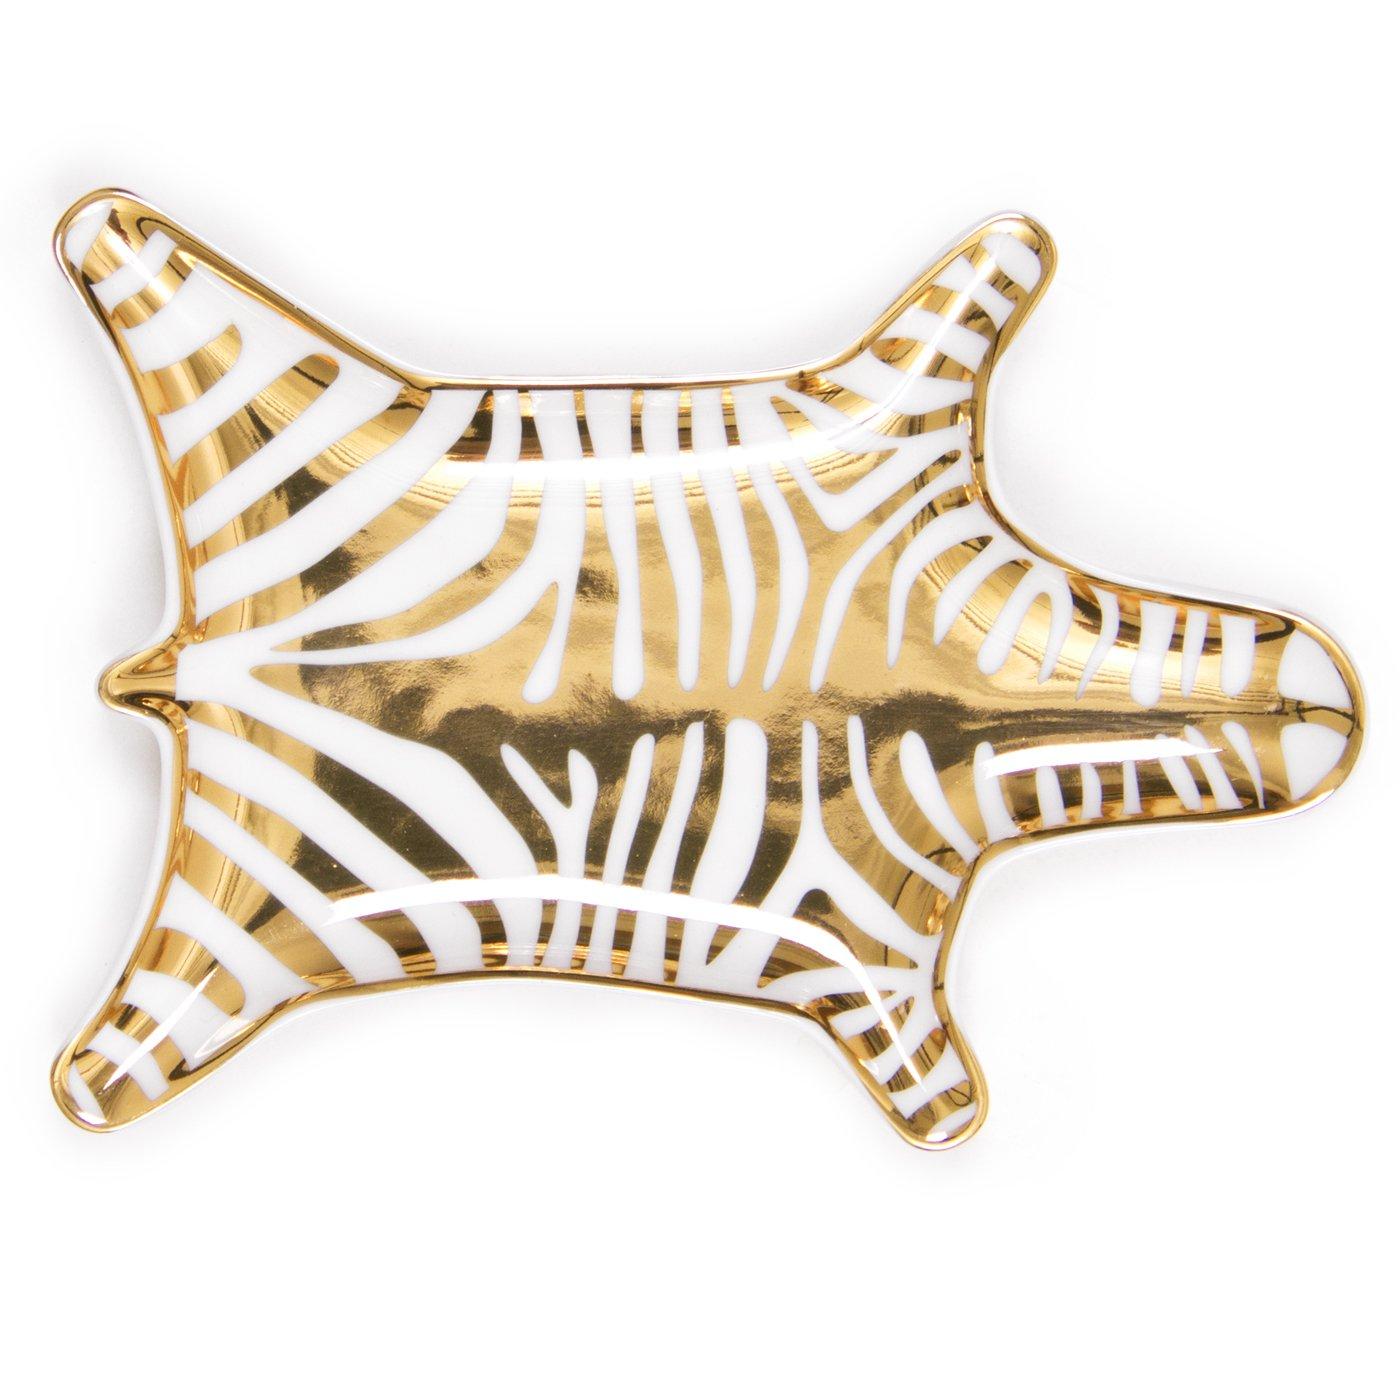 Jonathan Adler Metallic Zebra Dish, Gold